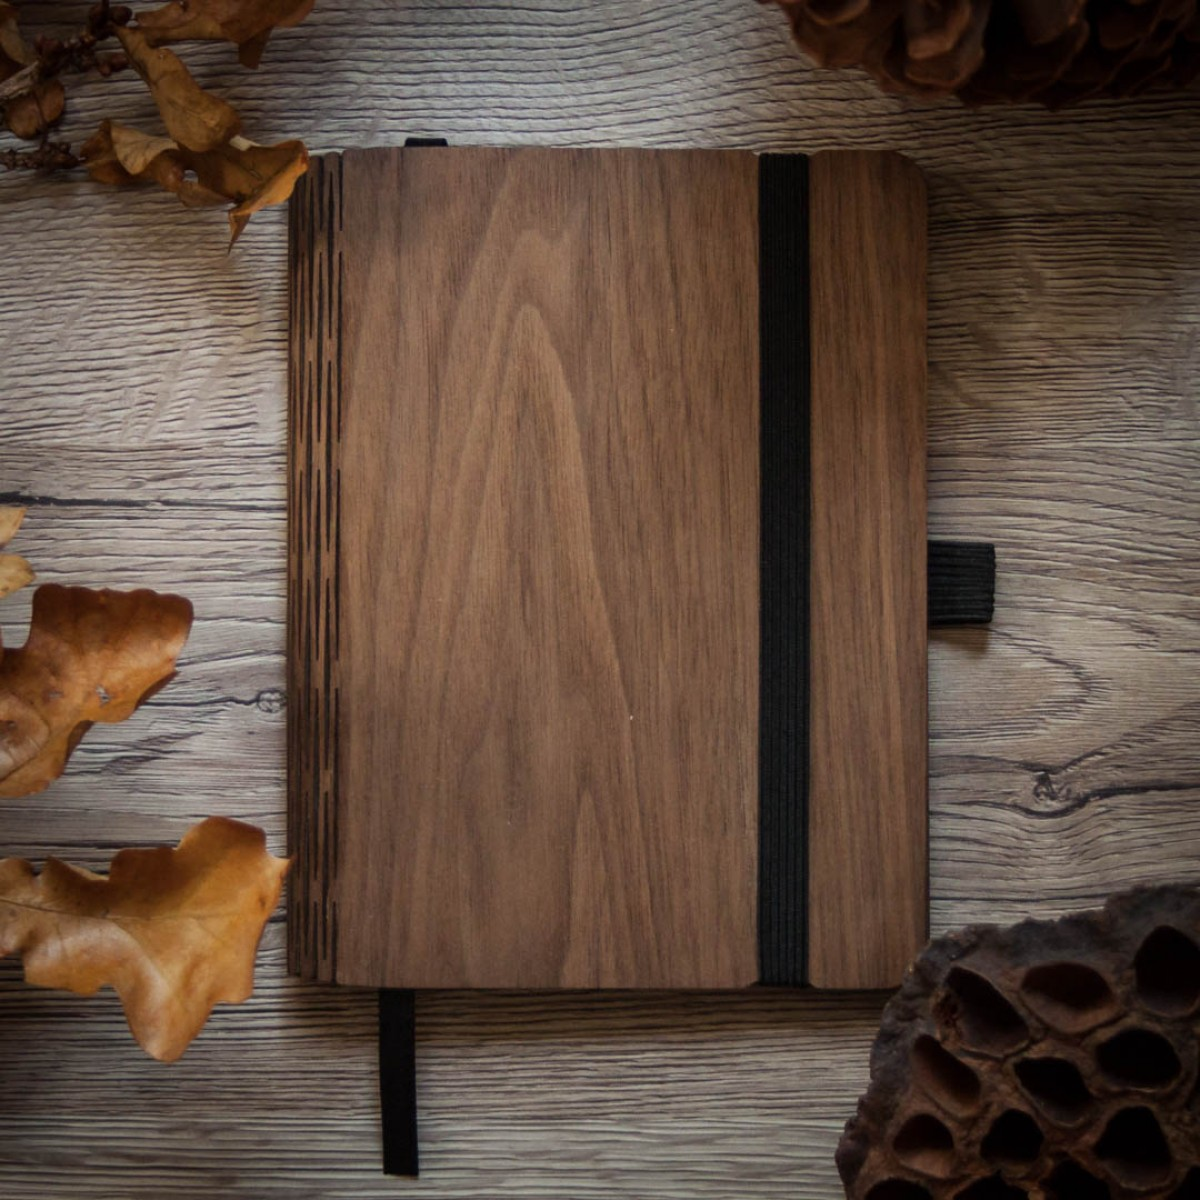 JUNGHOLZ Design Notizbuch, WoodBook, Walnuss, A6